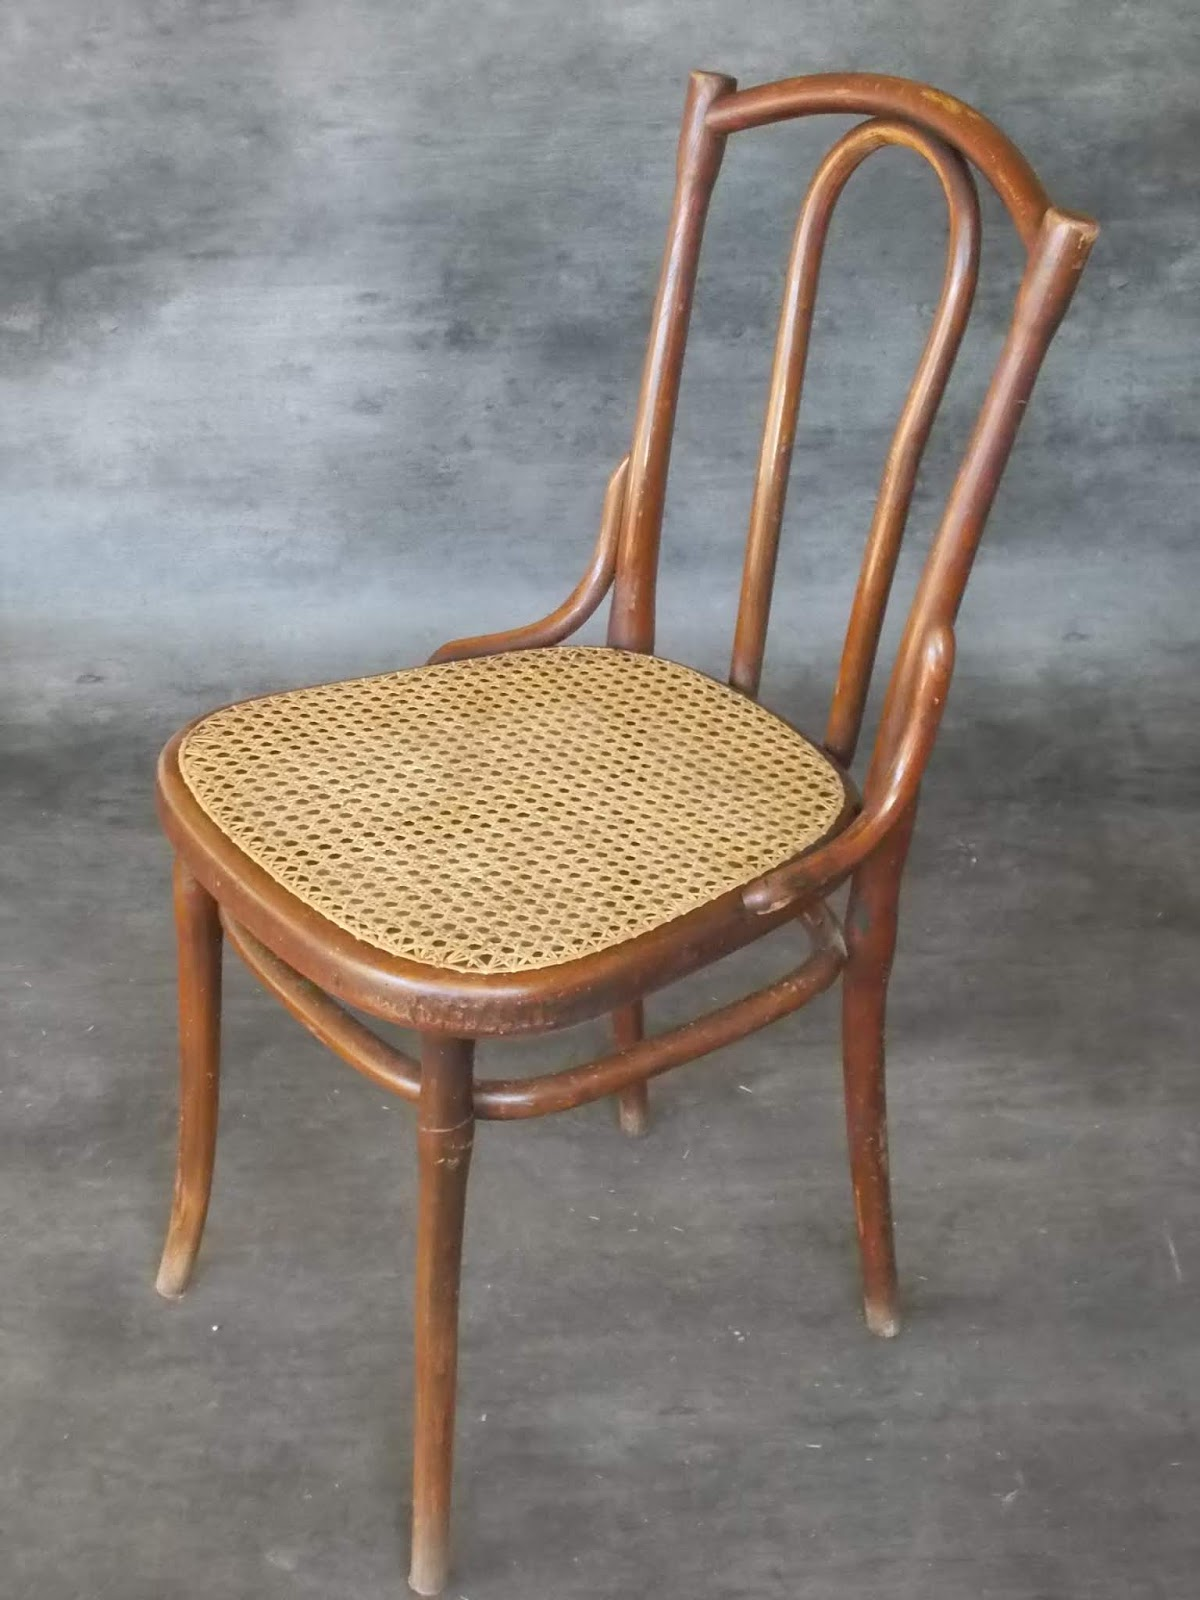 cannage rempaillage chaise tarif prix 2013. Black Bedroom Furniture Sets. Home Design Ideas